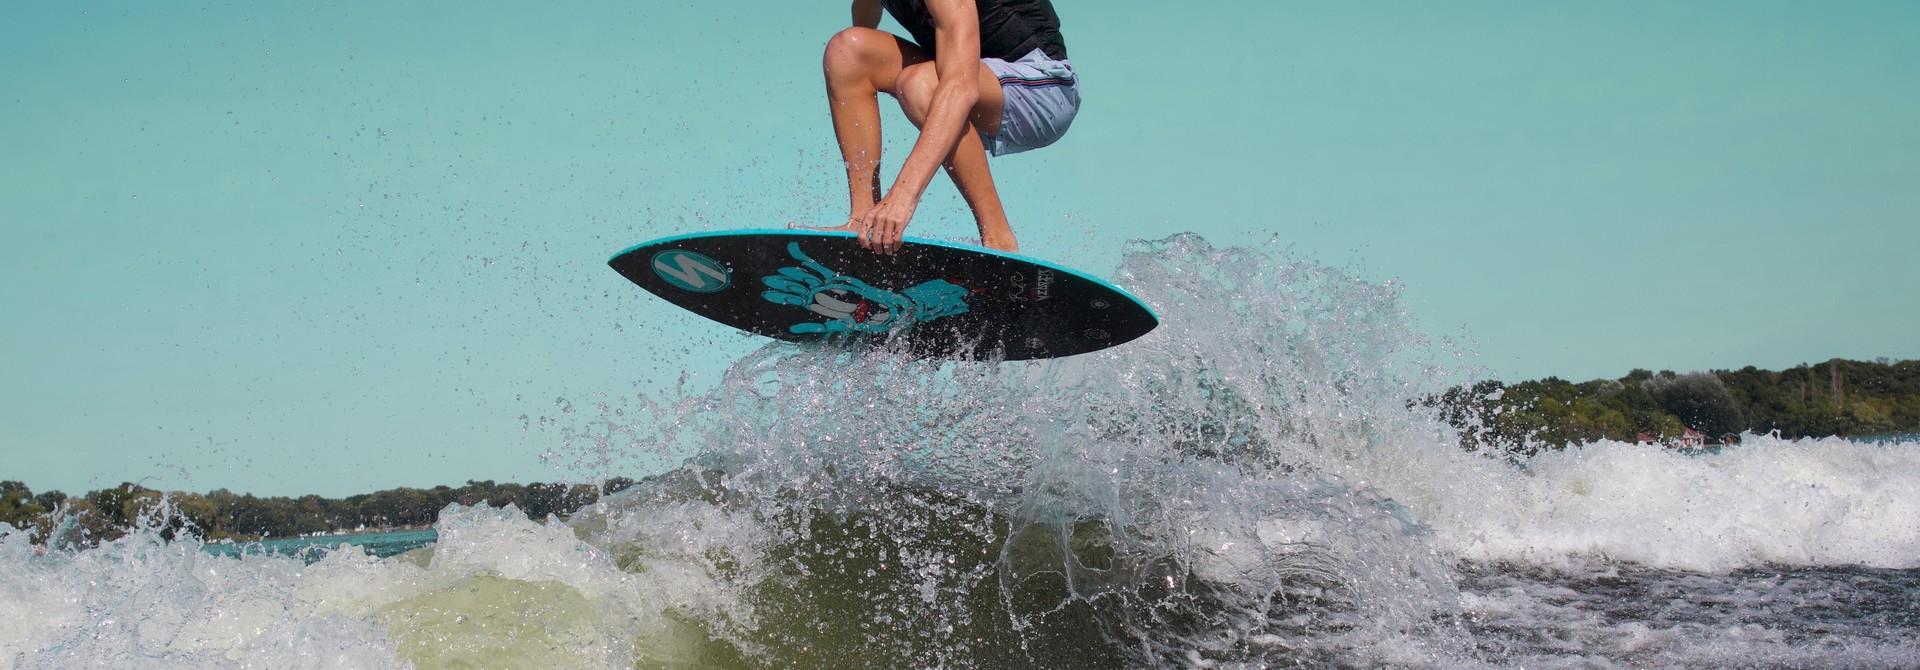 Skim Style Boards